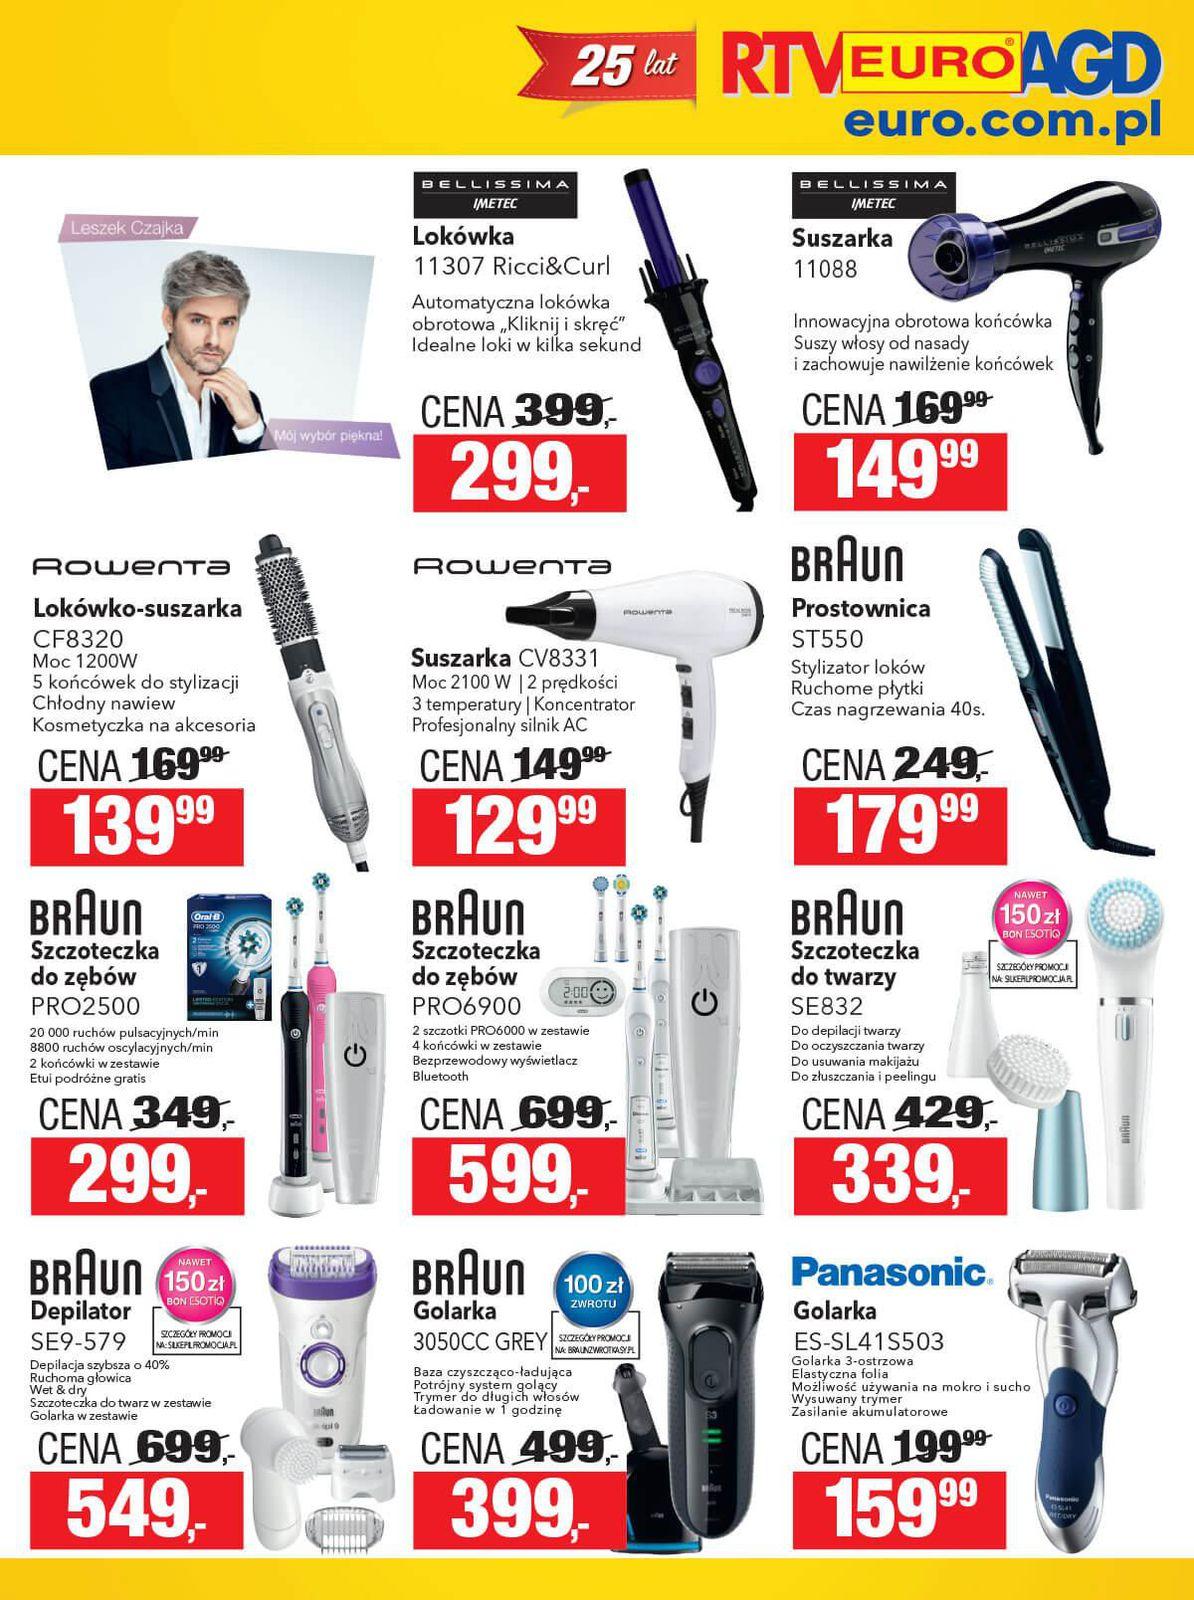 Gazetka promocyjna RTV Euro AGD do 31/12/2015 str.14